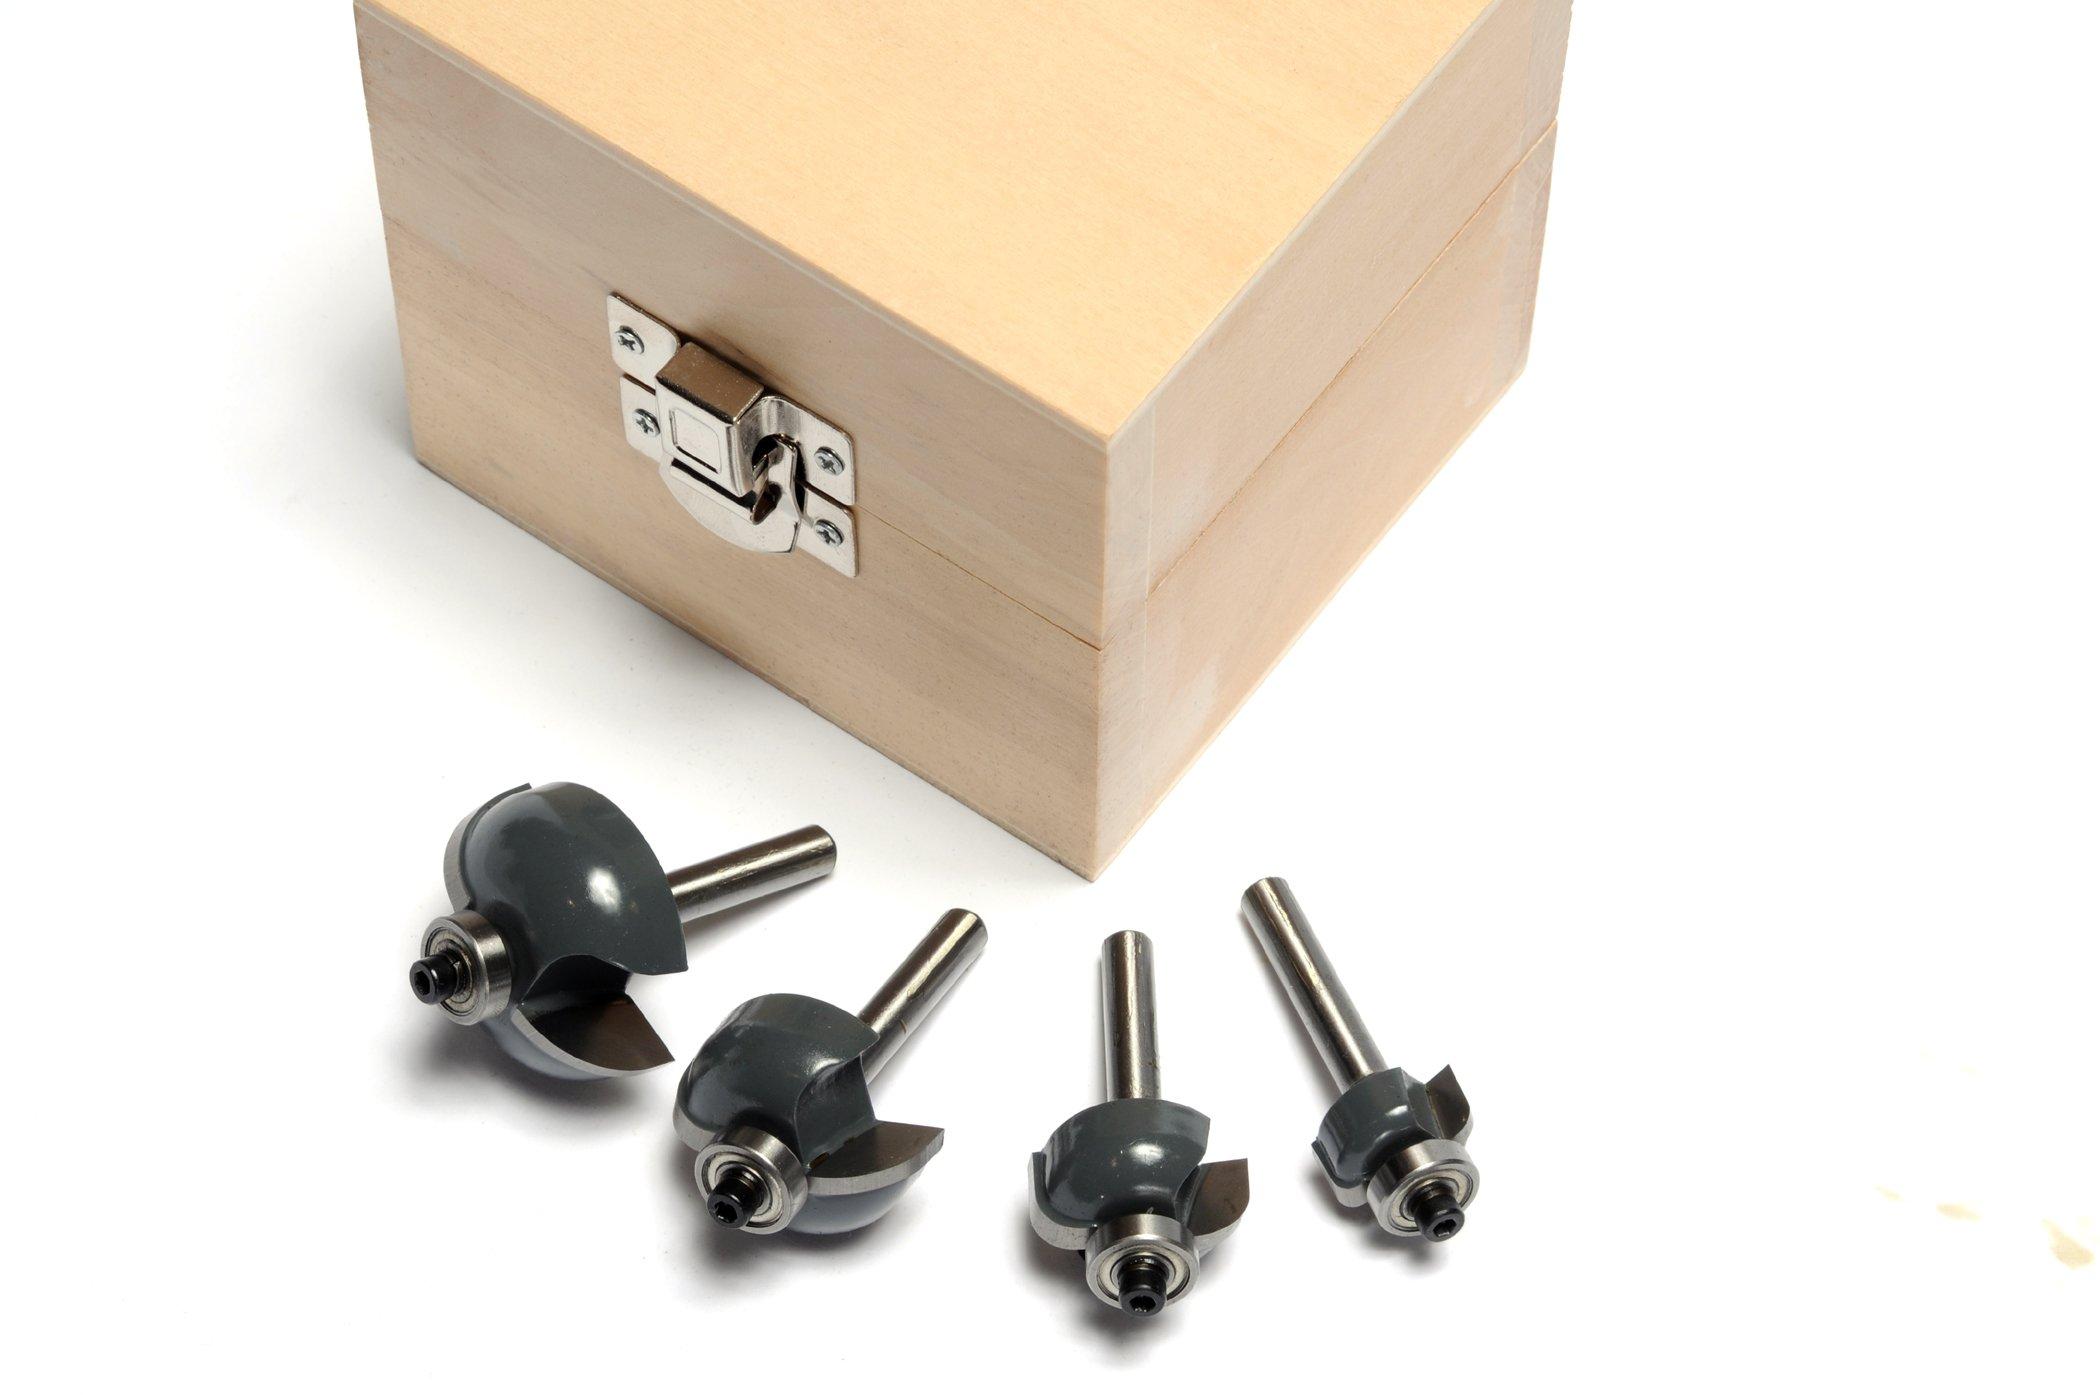 MLCS 6082 1/4-Inch Shank Cove Router Bit Boxed Set, 4-Piece